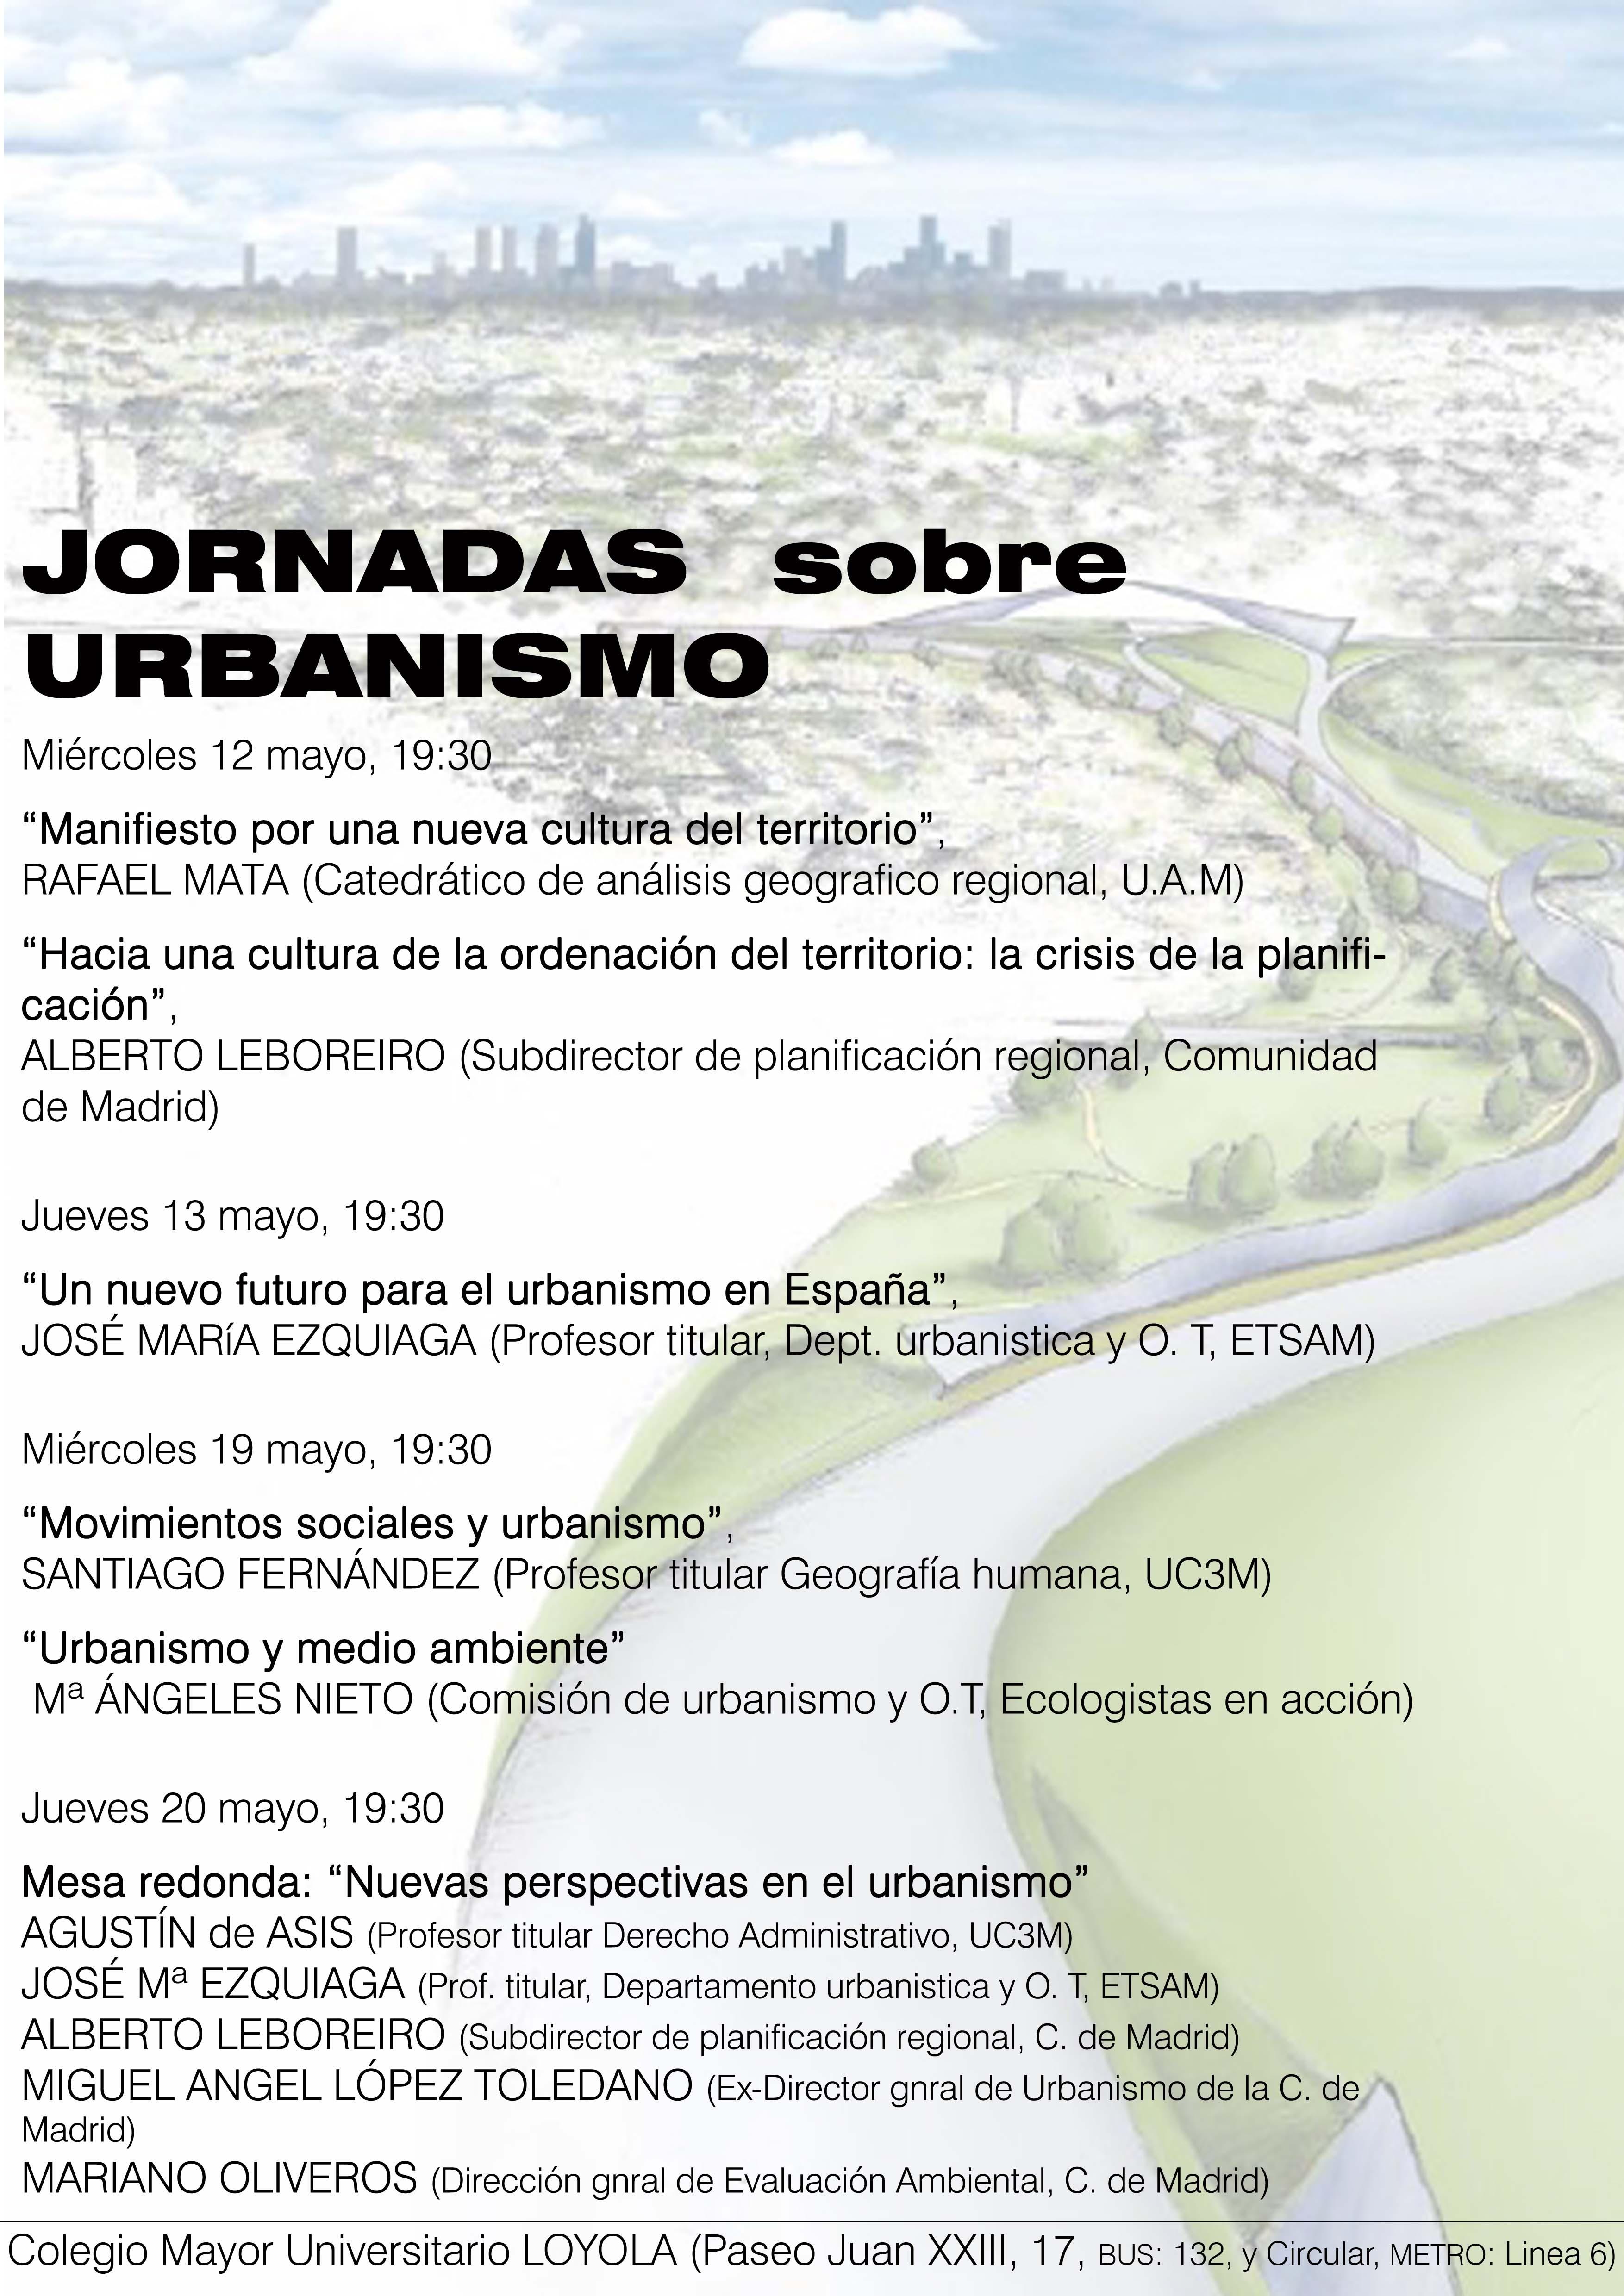 jornadas urbanismo loyola